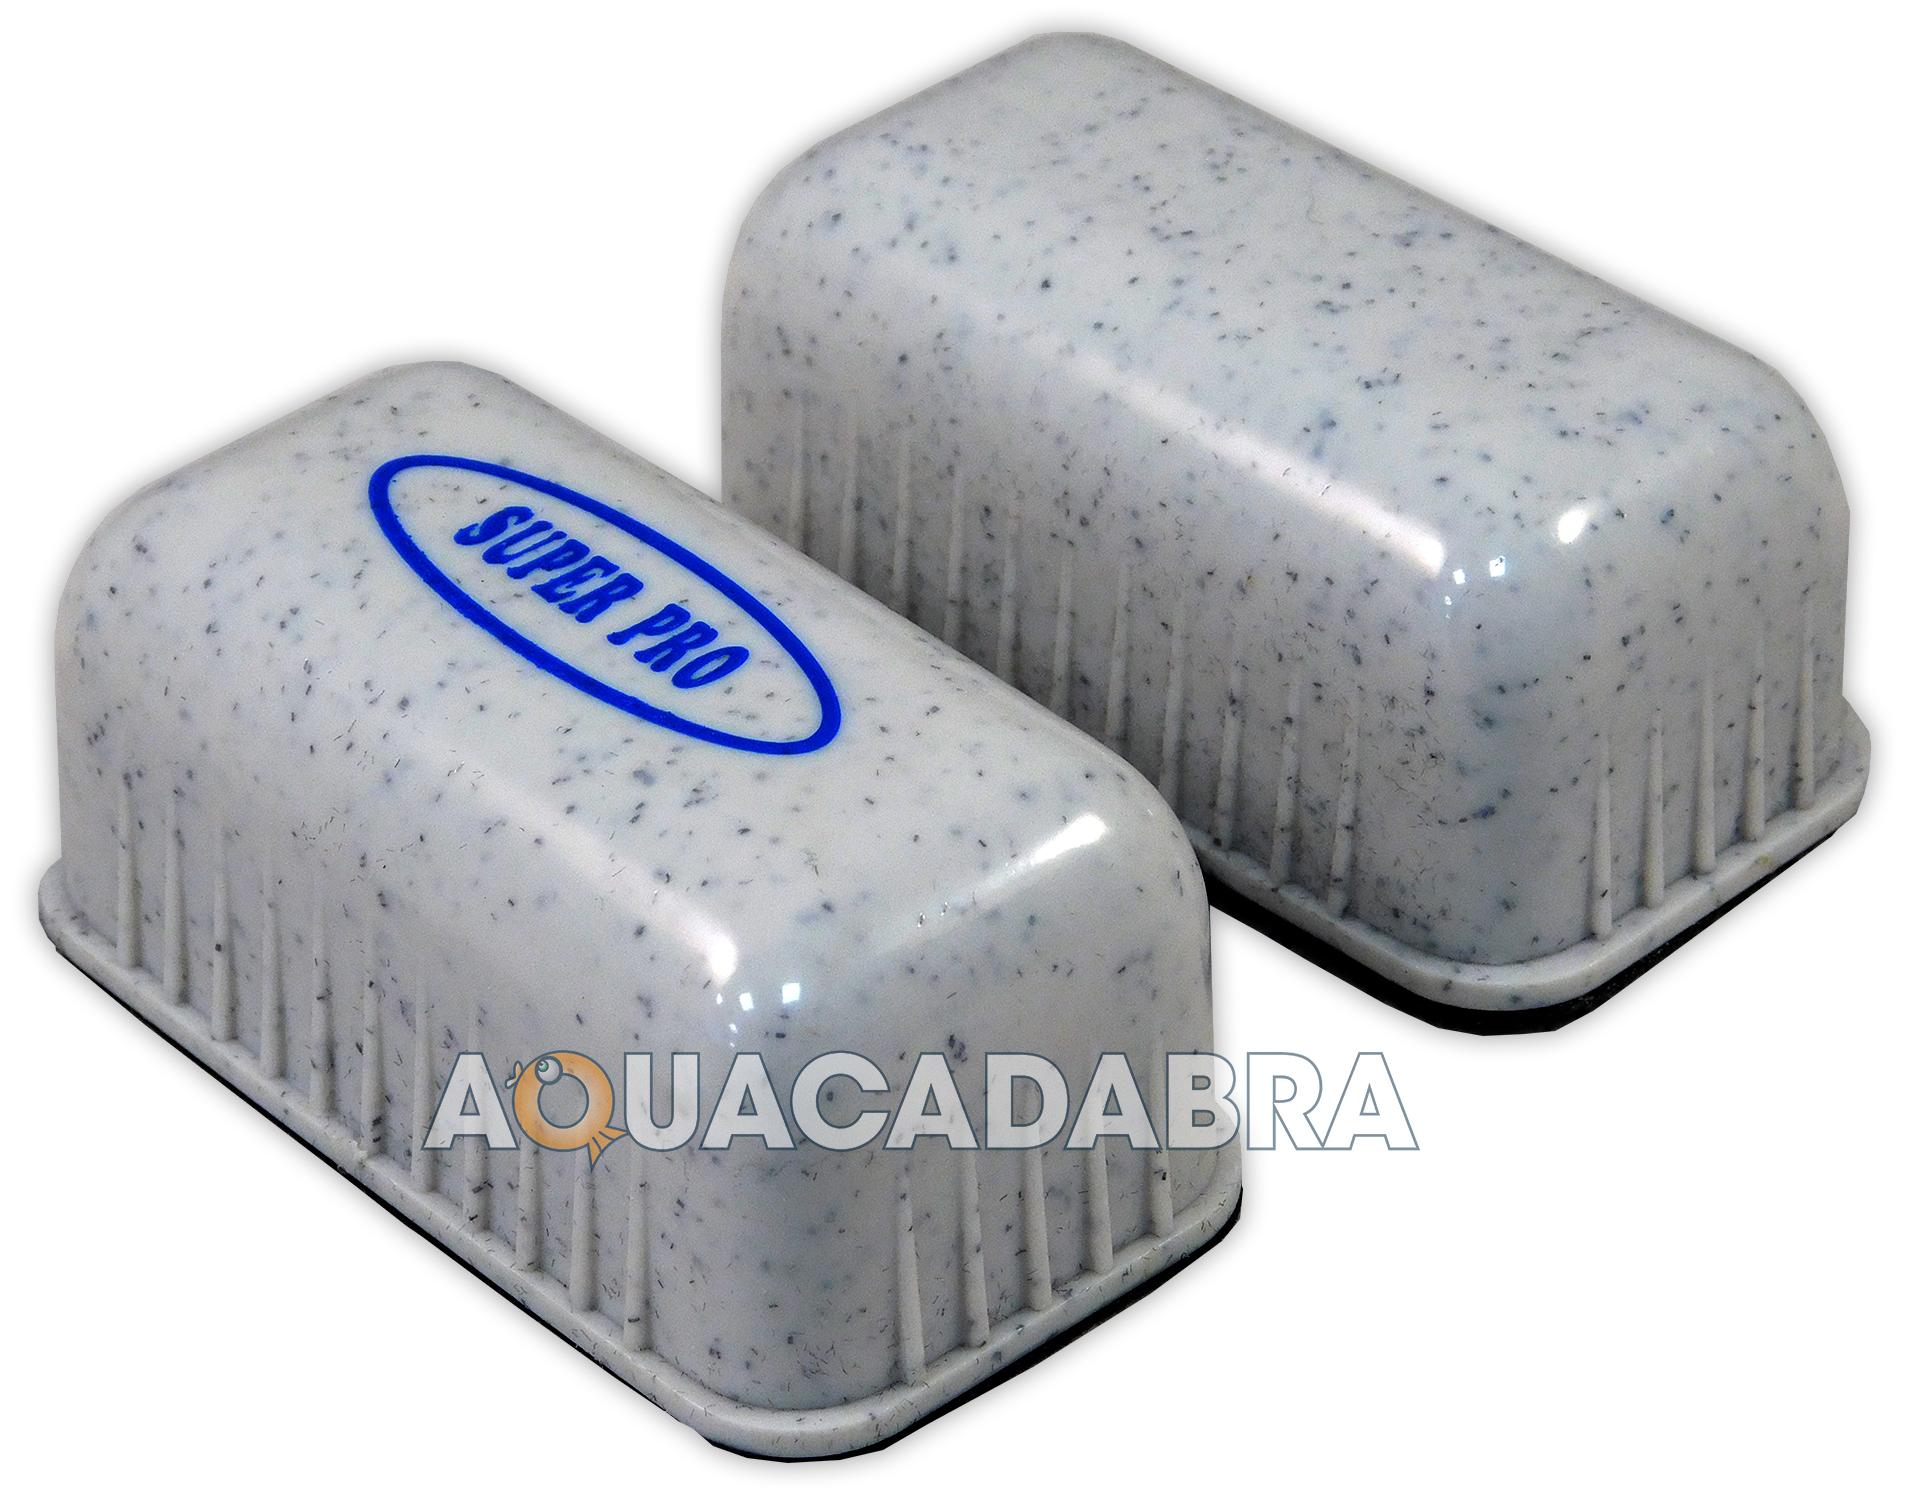 Superpro magnet cleaner floating small algae remover glass for Fish tank algae remover